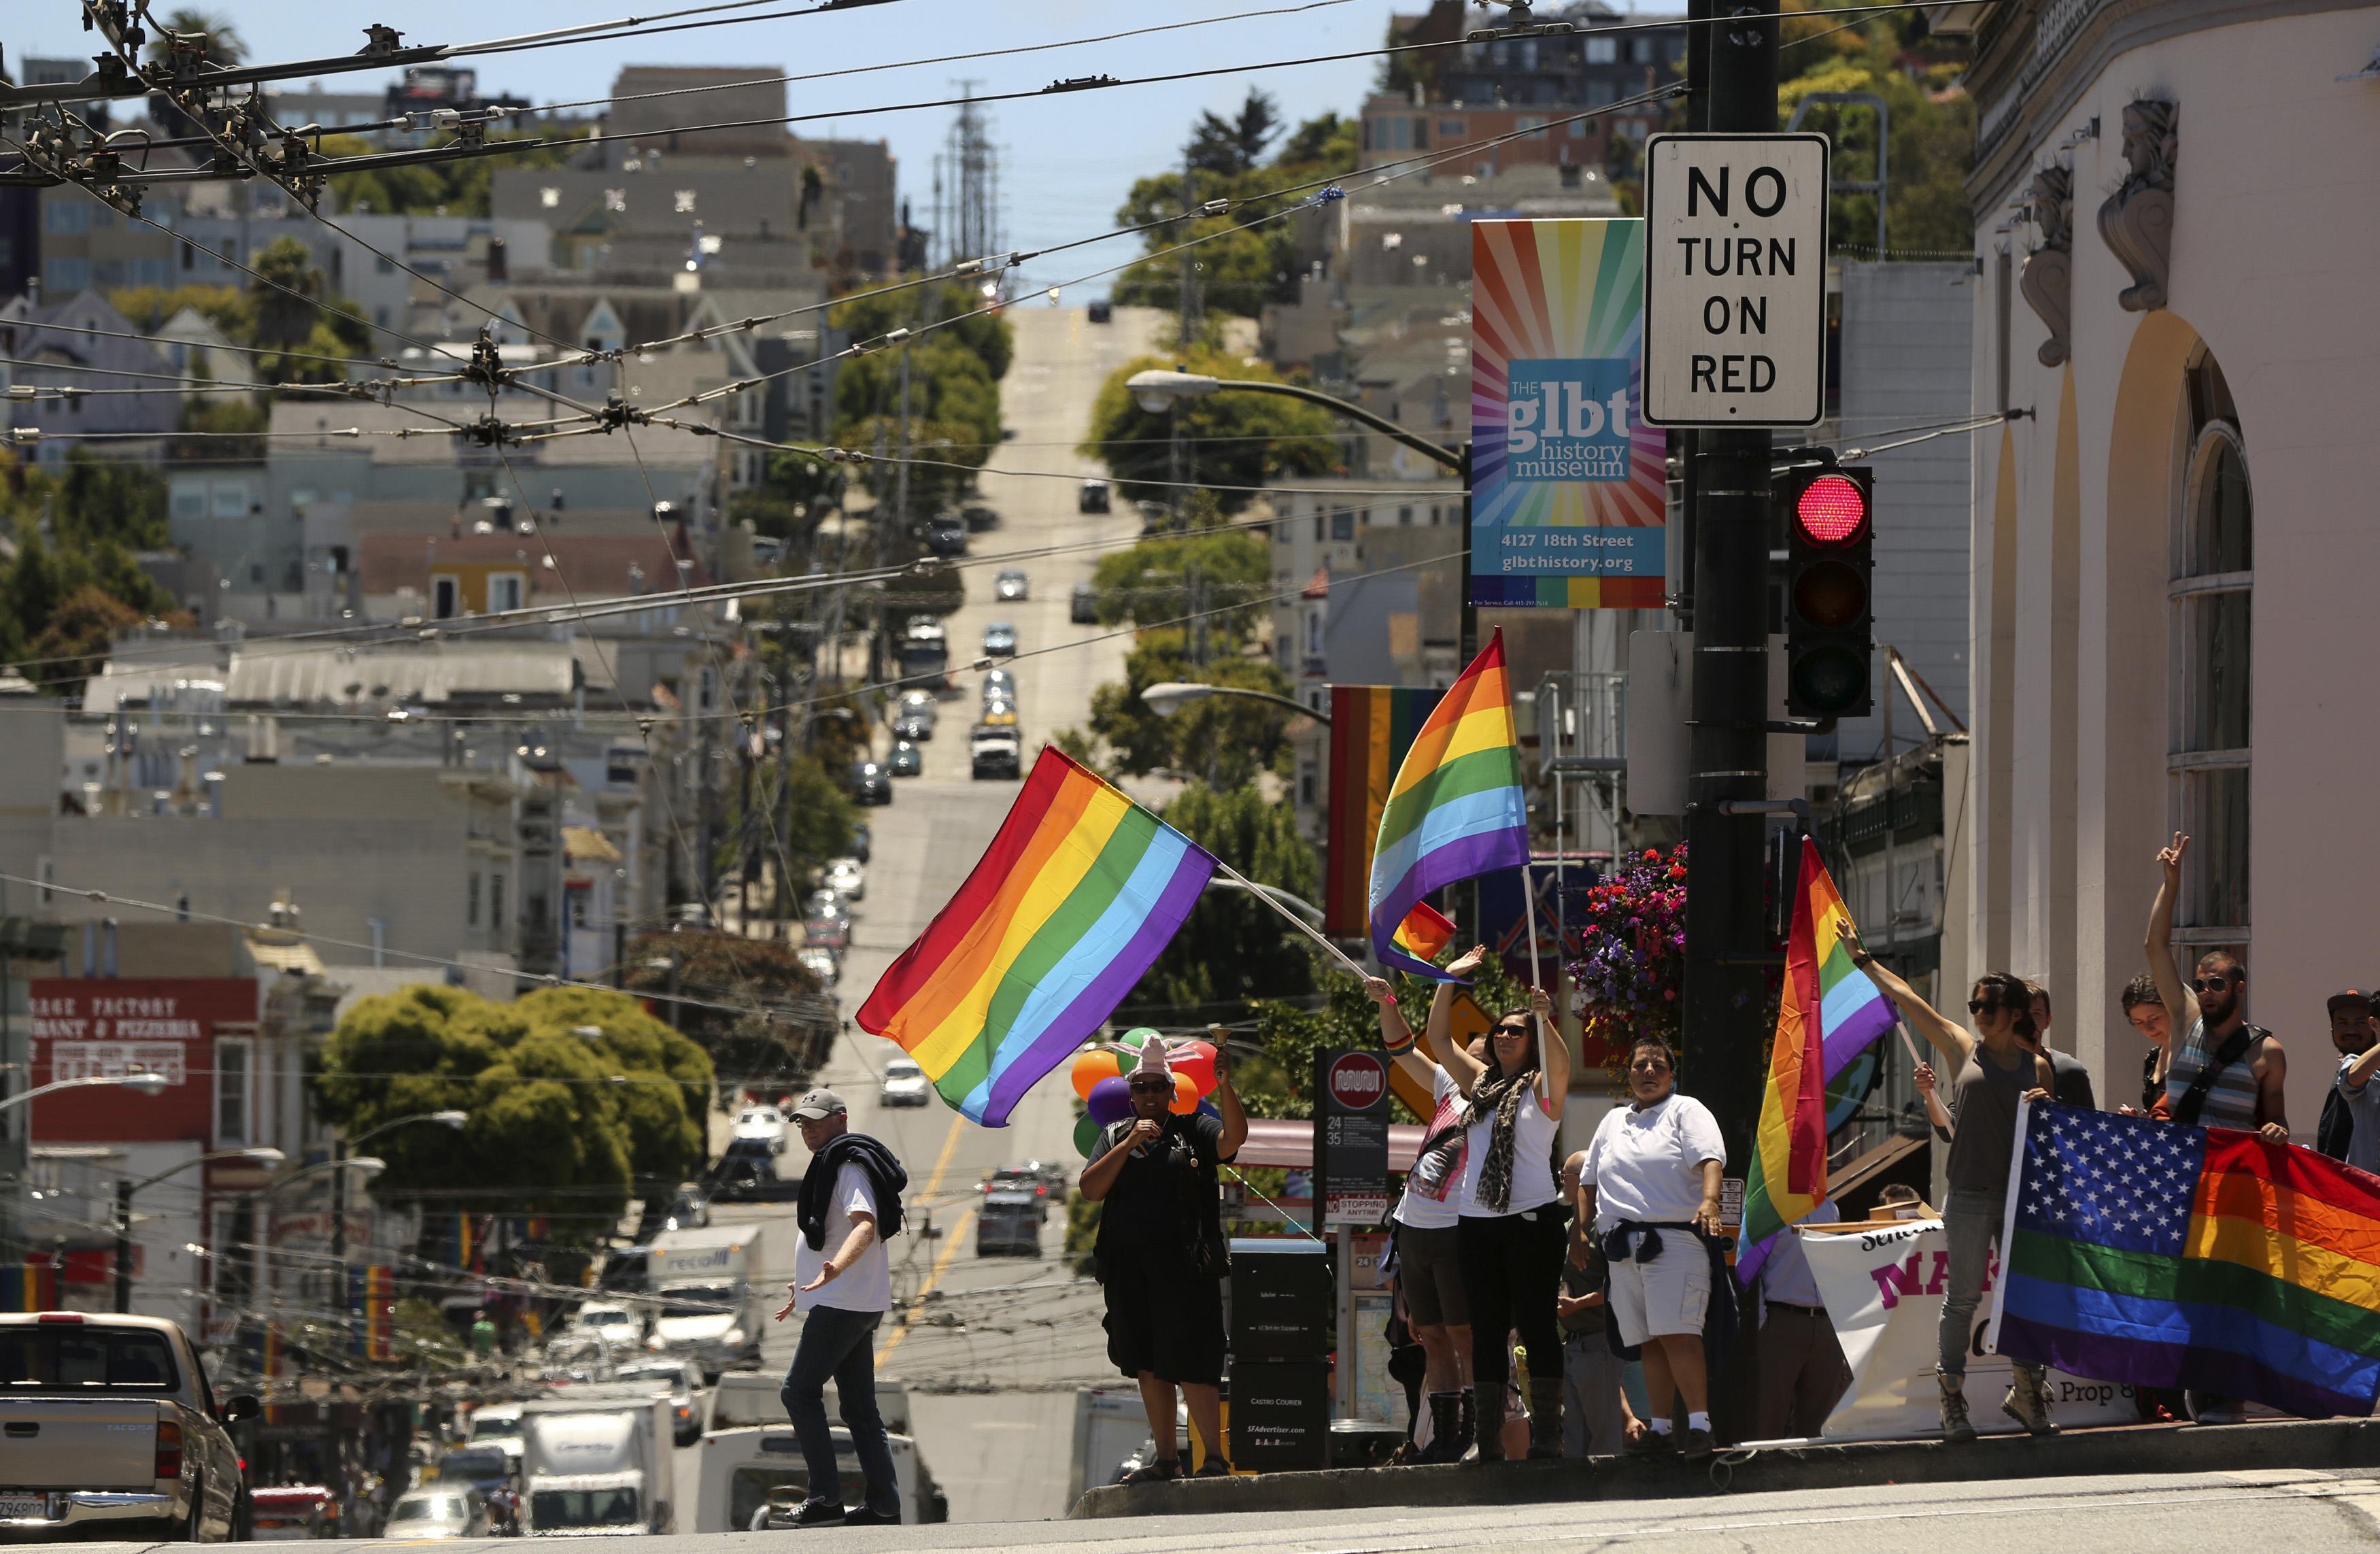 Castro neighborhood in San Francisco